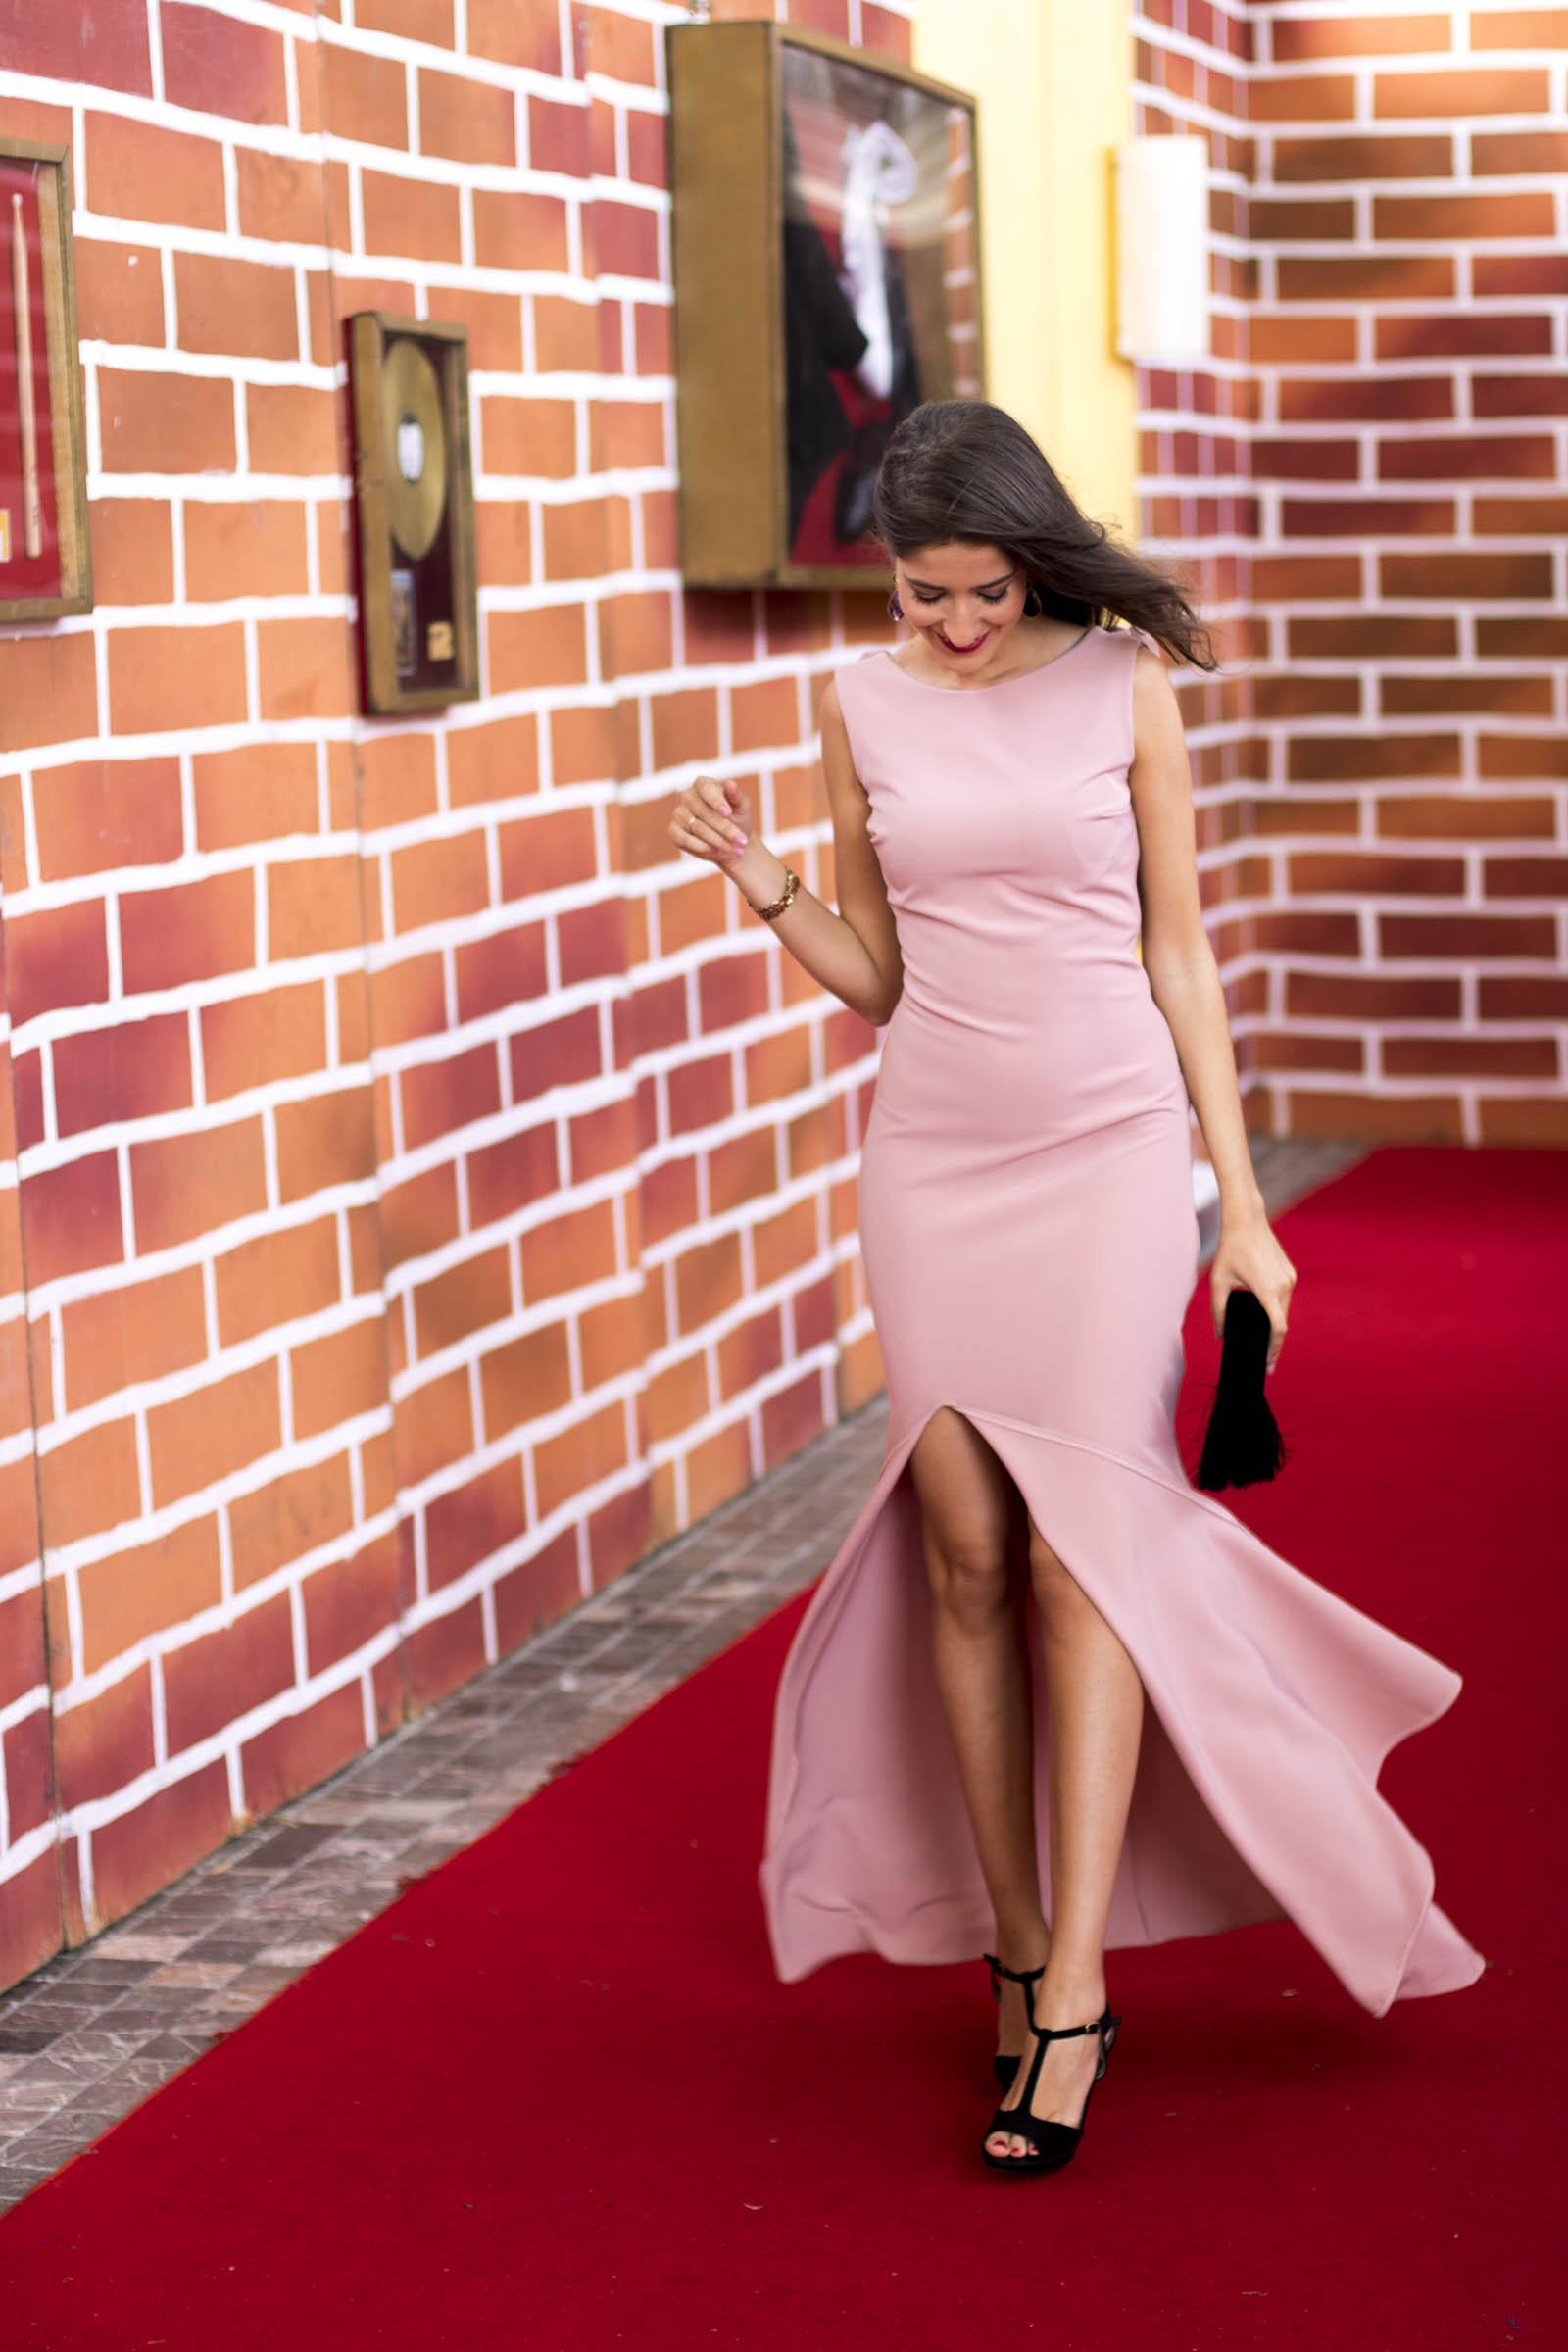 invitada-boda-noche-vestido-rosa-espalda-caireles-16 – Invitada ...